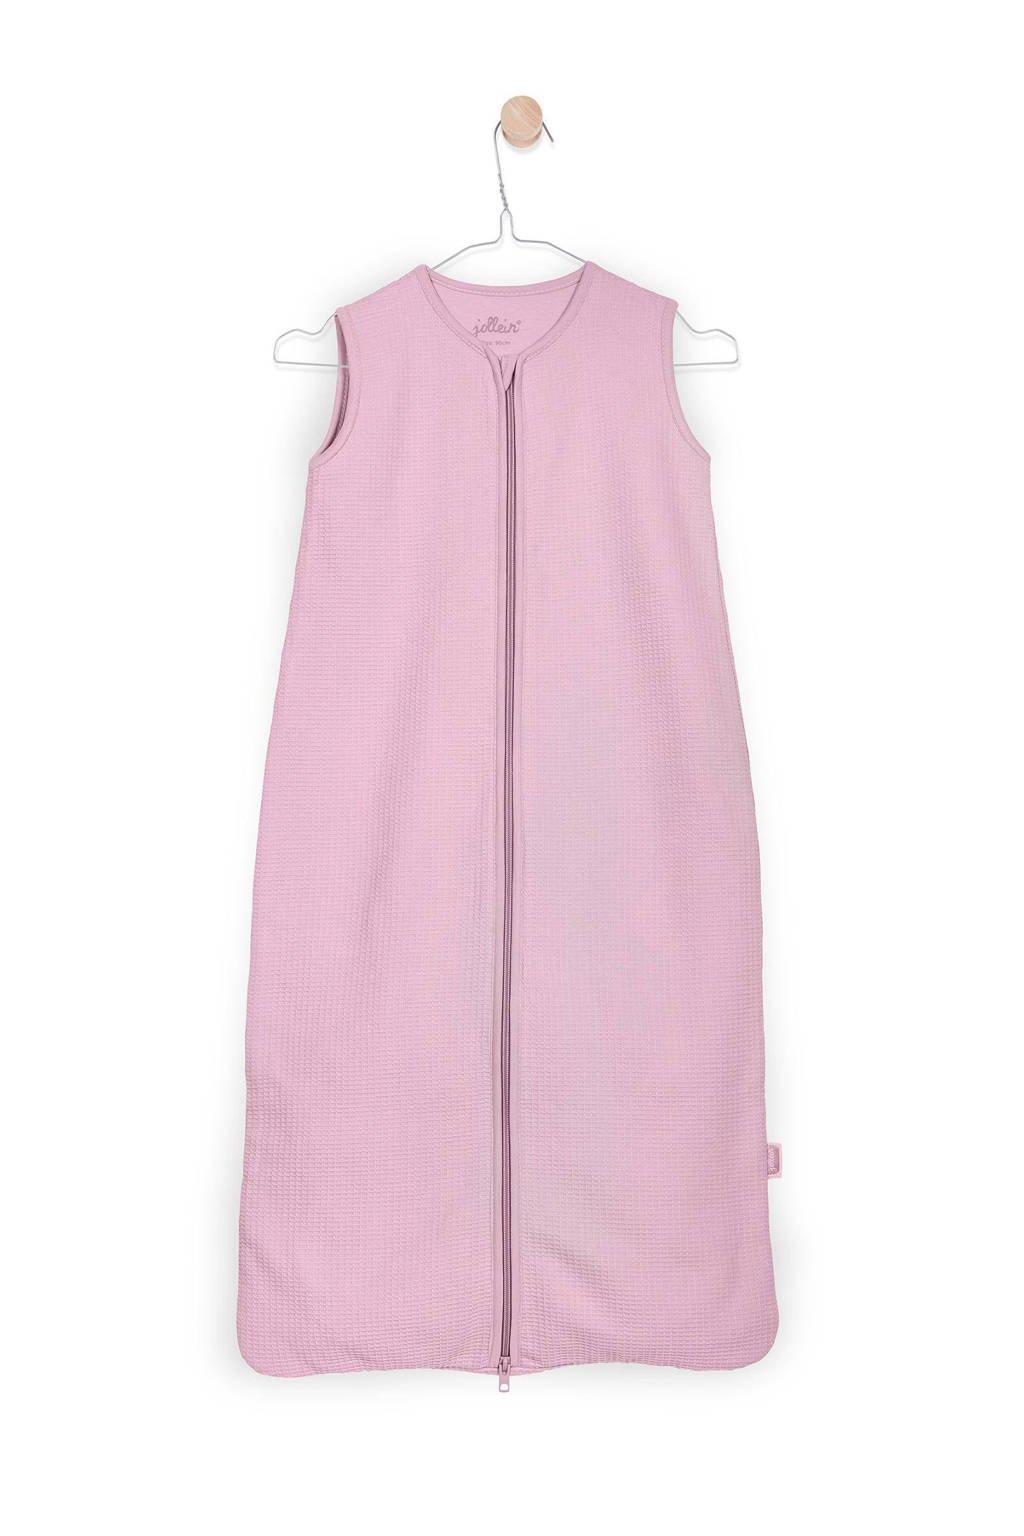 Jollein Mini Waffle zomer baby slaapzak 0-6 mnd roze, Vintage Pink, 70